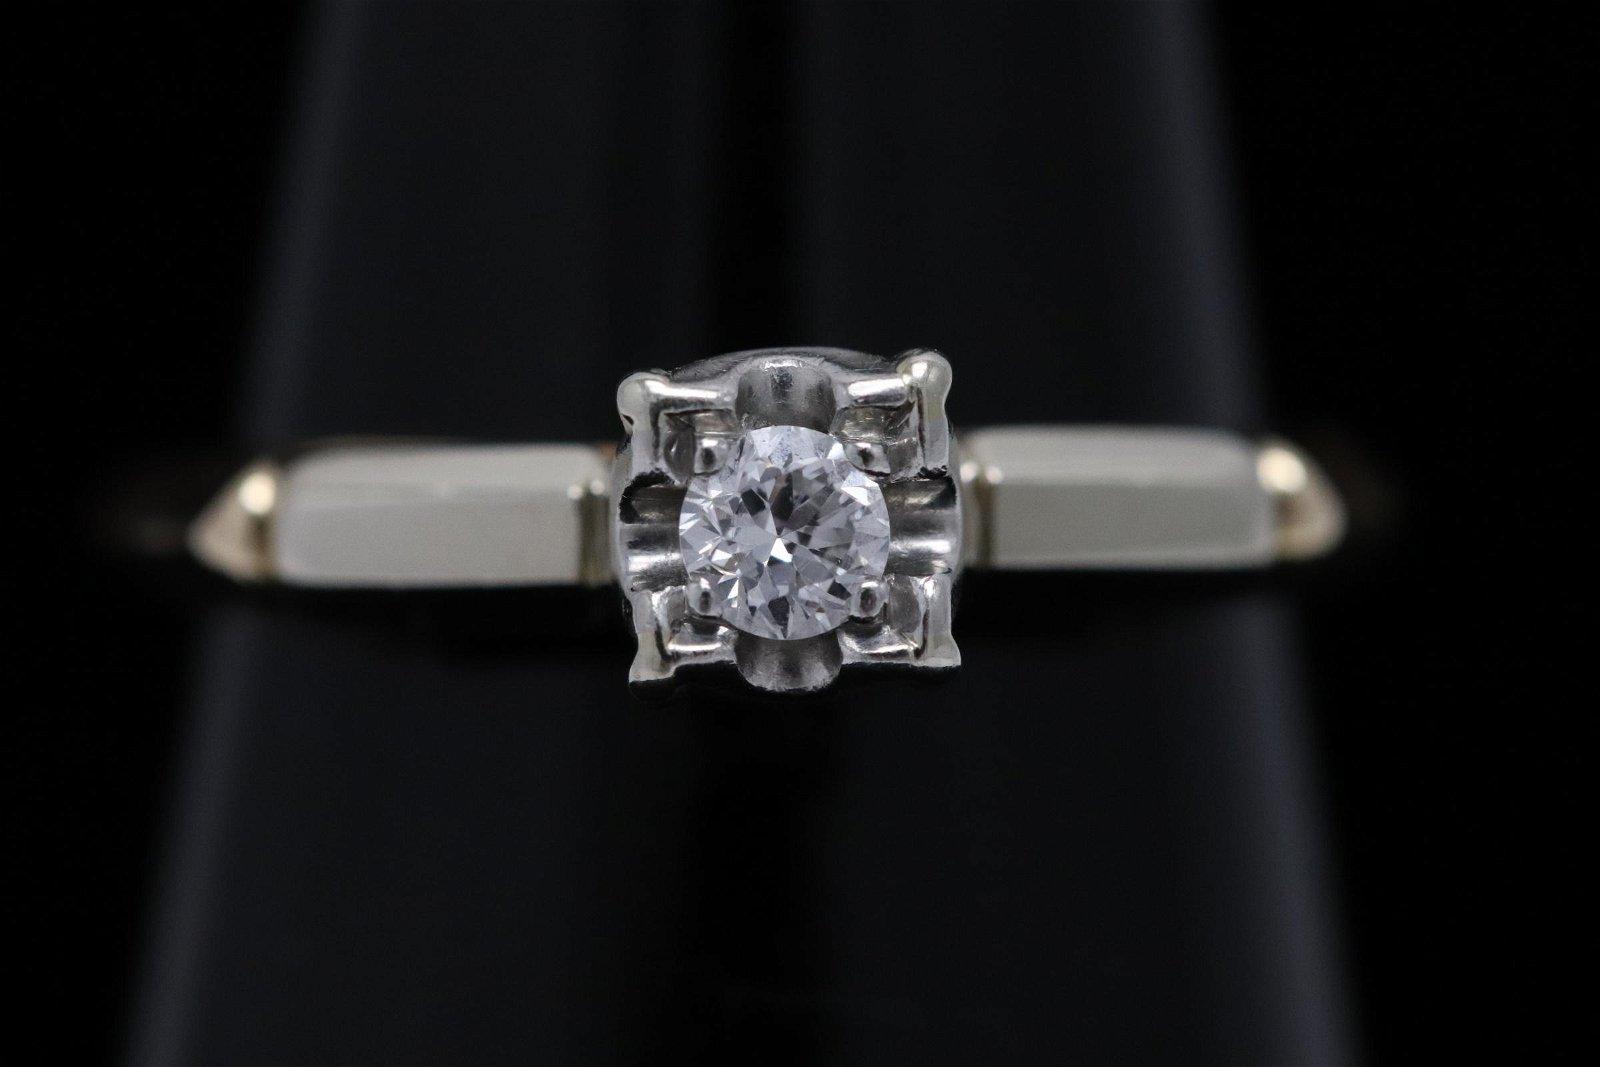 Victorian 14K Y/G w/ 18K W/G top diamond ring